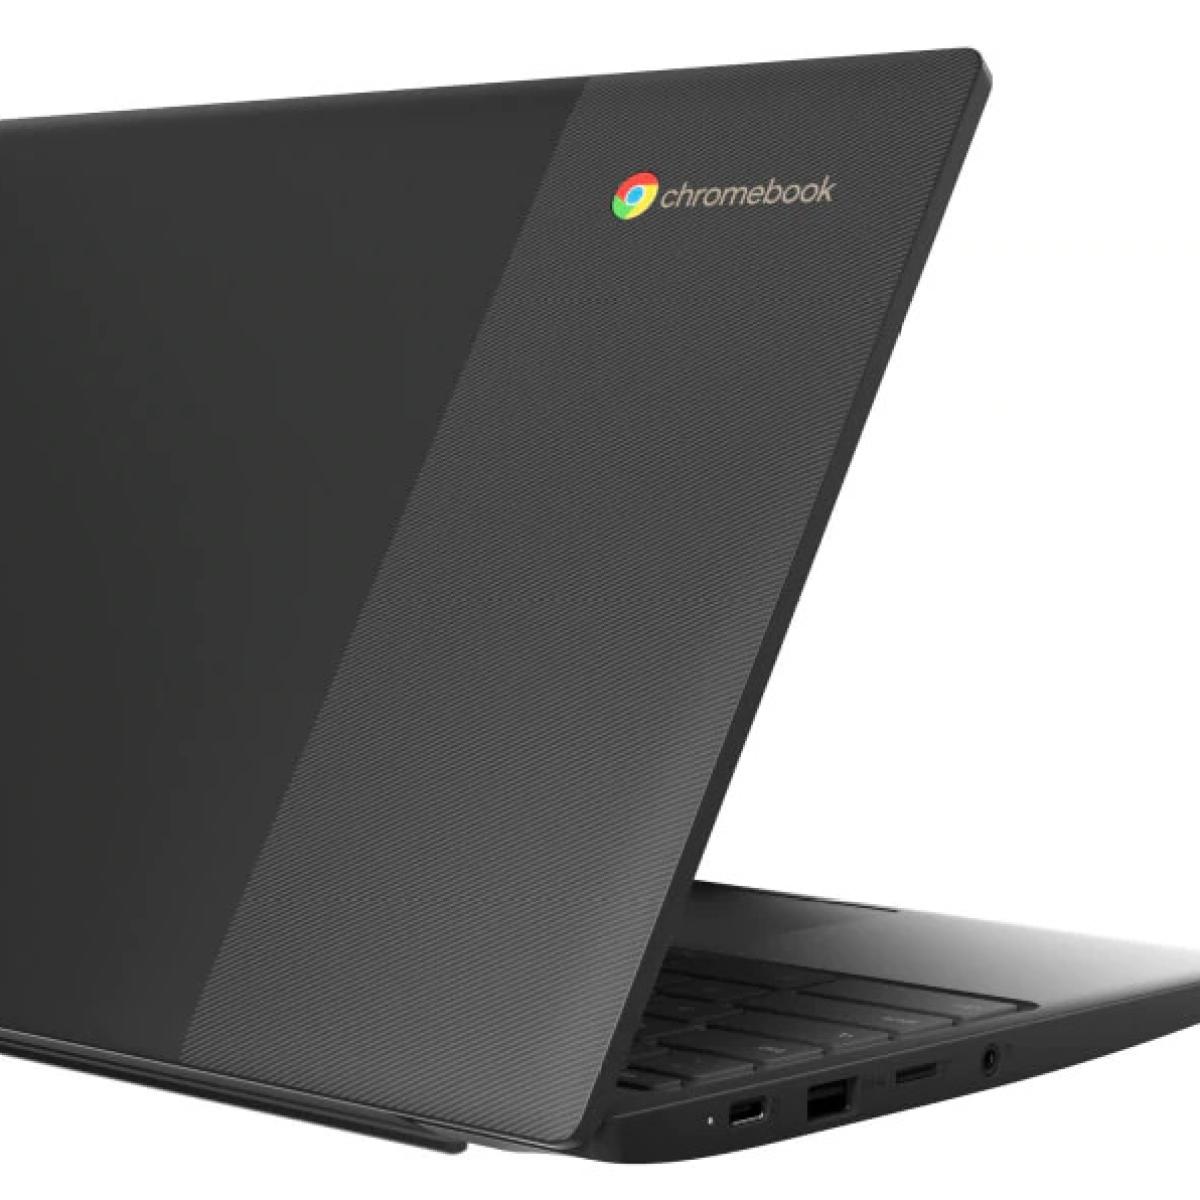 Lenovo launches Chromebook 3